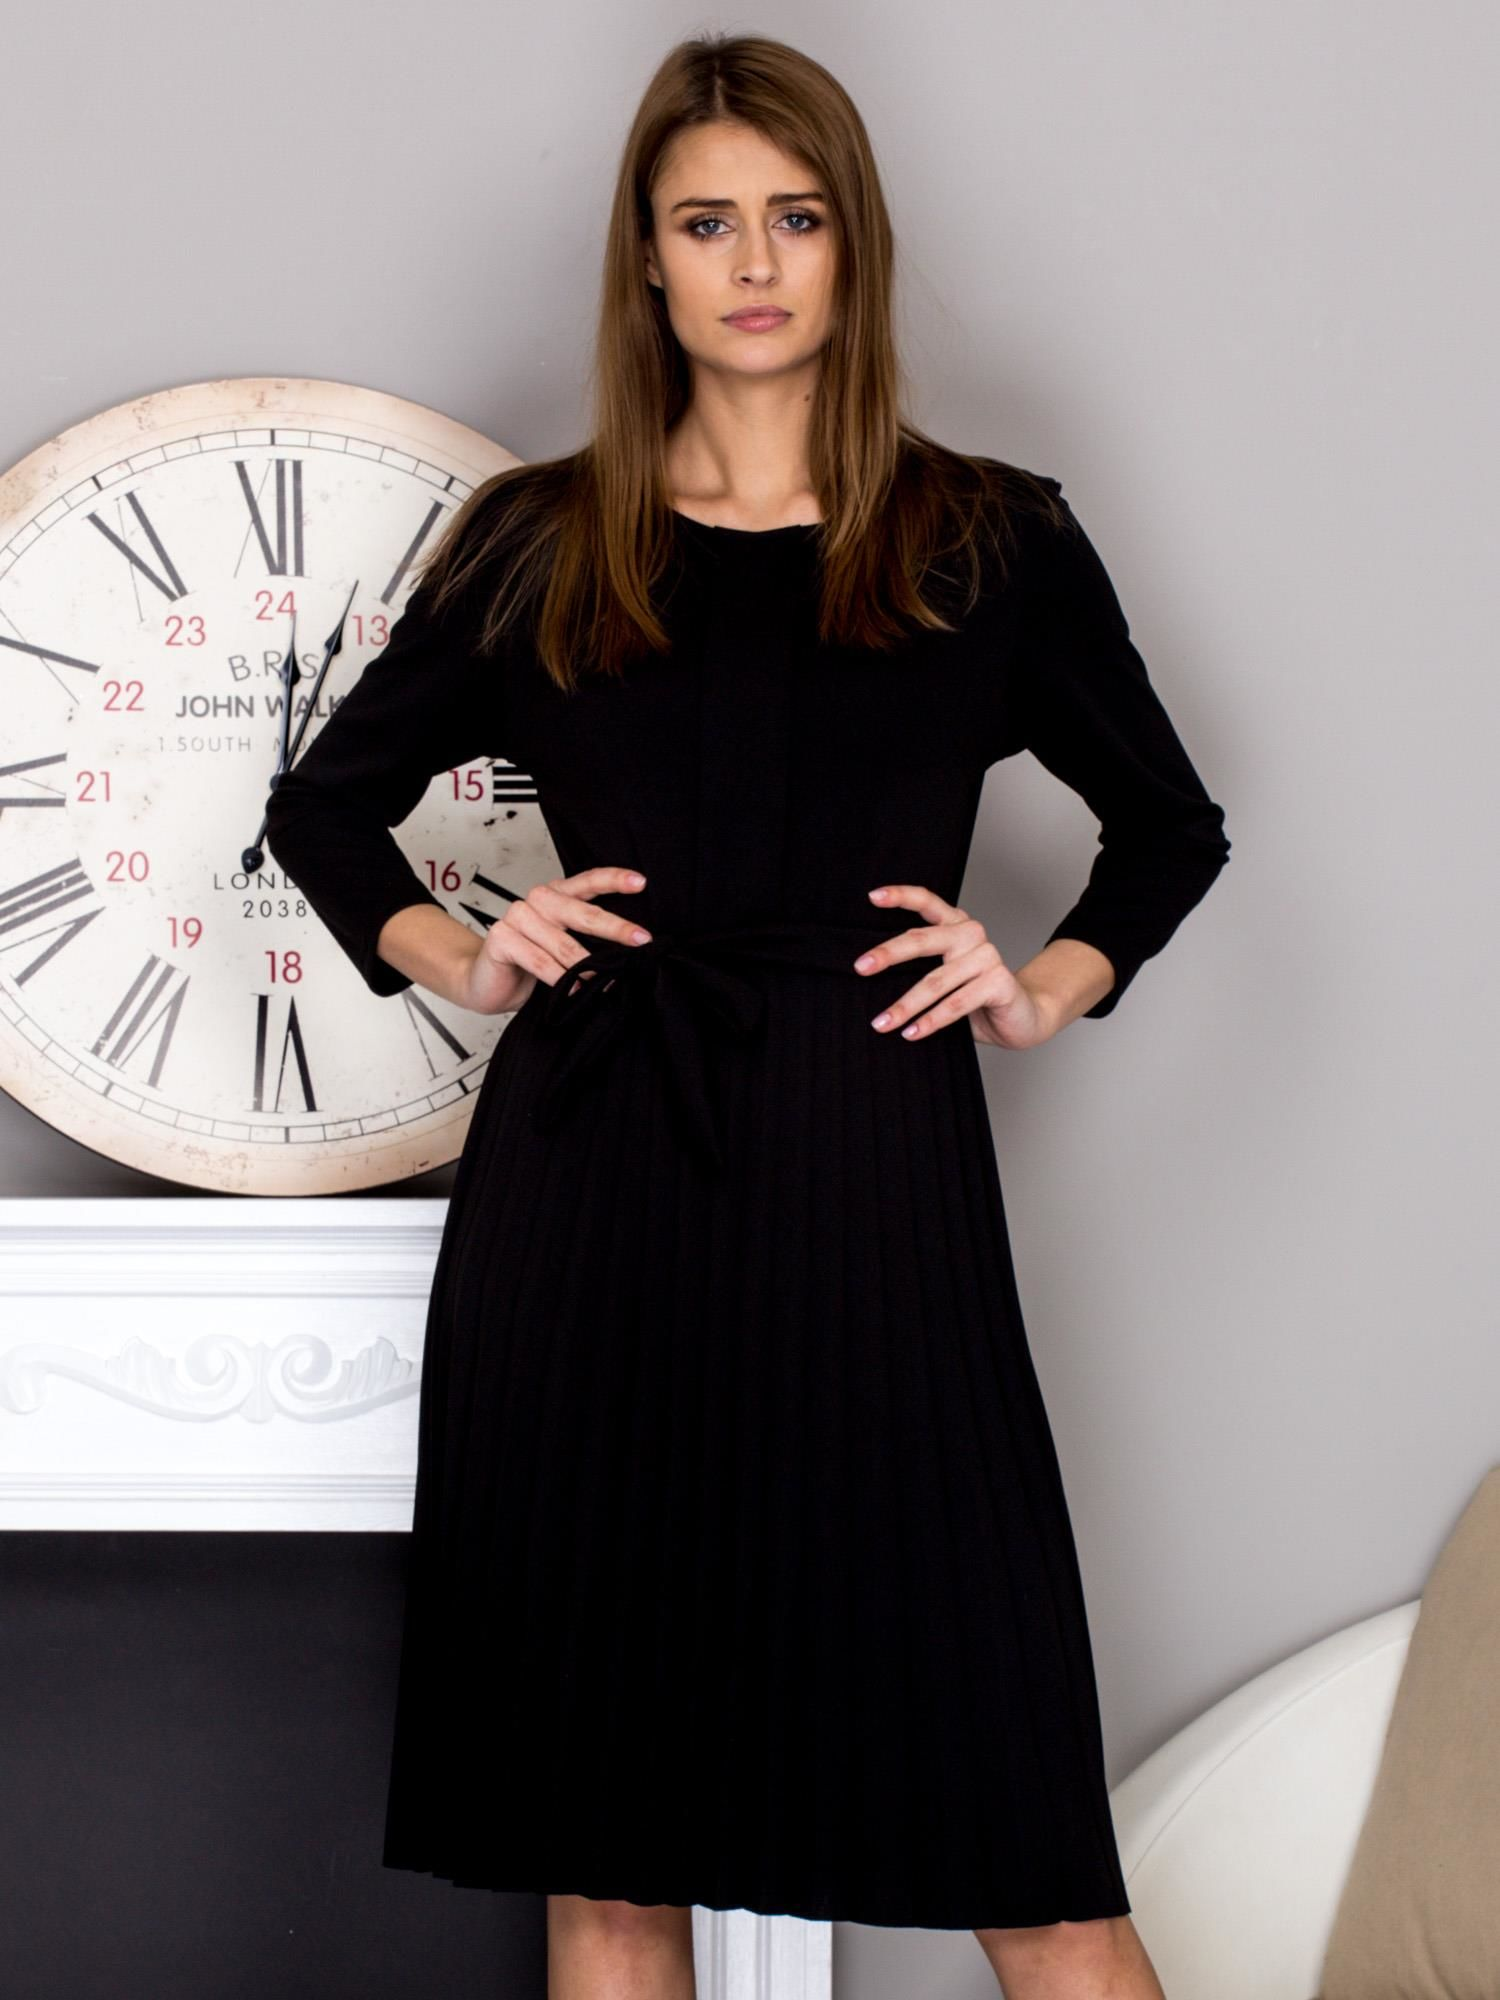 026ceb6640 Czarna sukienka koktajlowa z kokardą i plisowanym dołem - Sukienka  koktajlowa - sklep eButik.pl